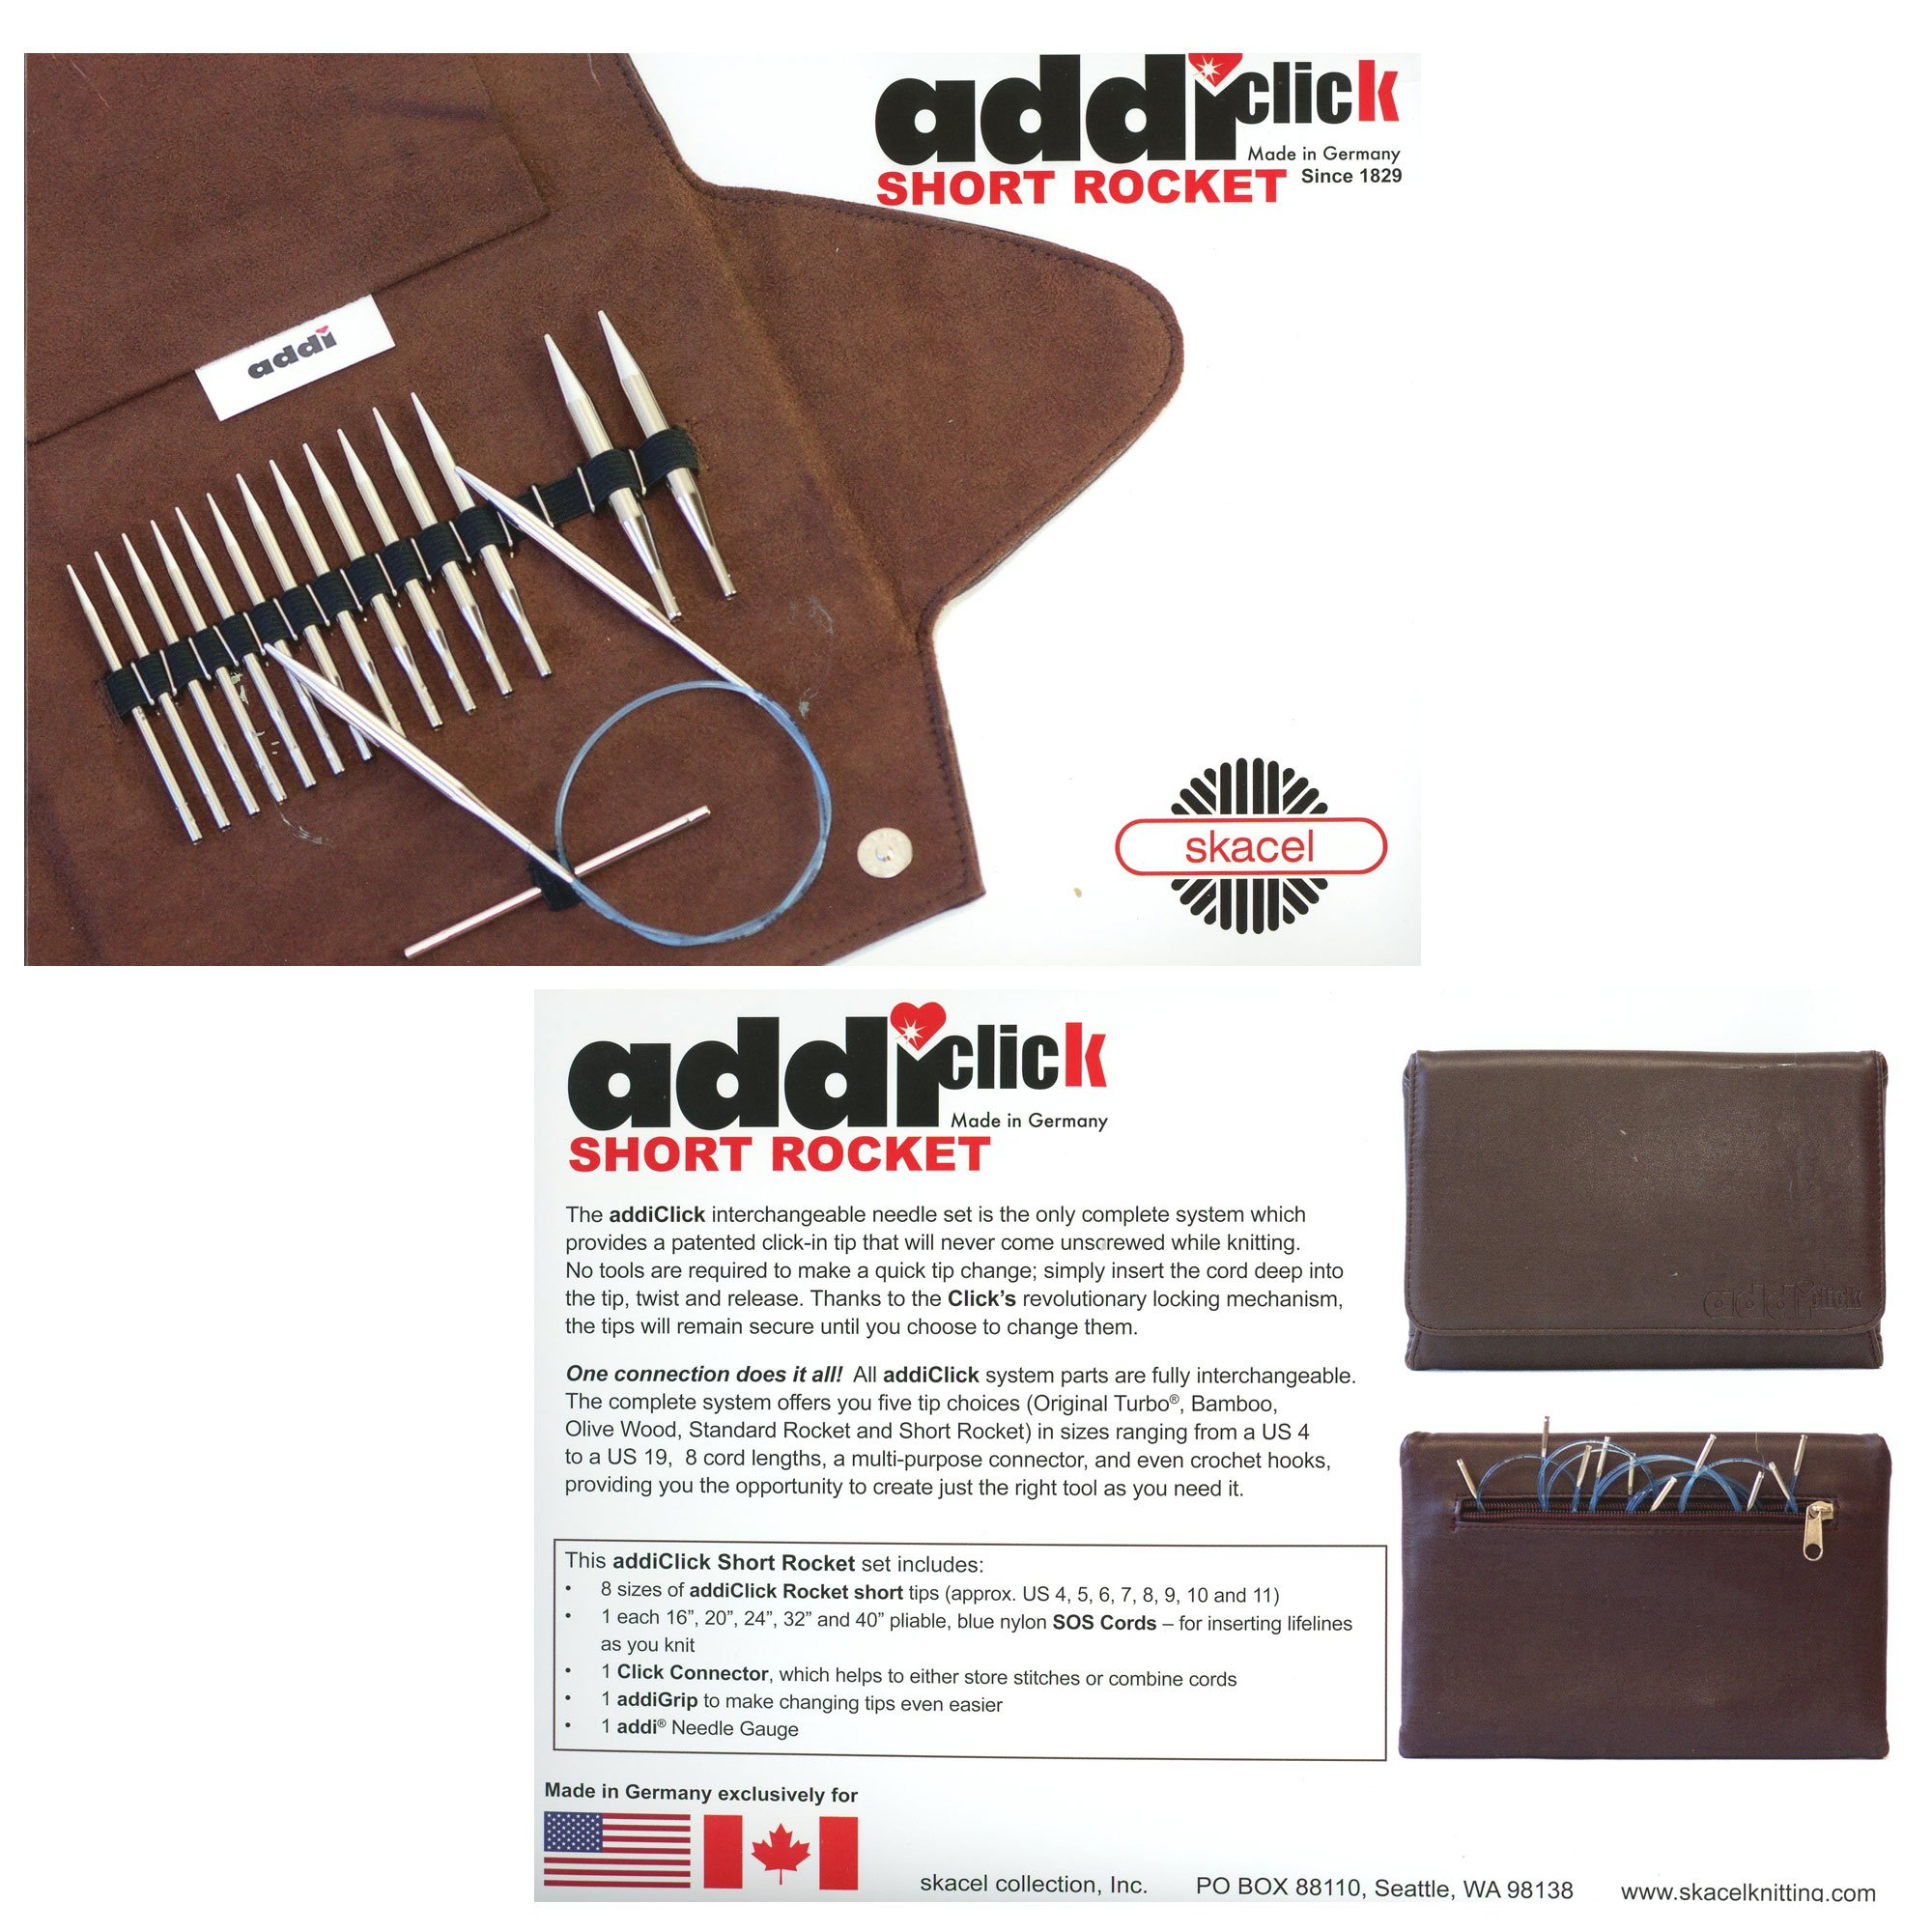 addi Knitting Needle Click Short Rocket Lace Interchangeable Circular System White-Bronze Finish Skacel Exclusive Blue Cords Bundle with 1 Artsiga Crafts Project Bag by Addi Knitting Needles (Image #3)